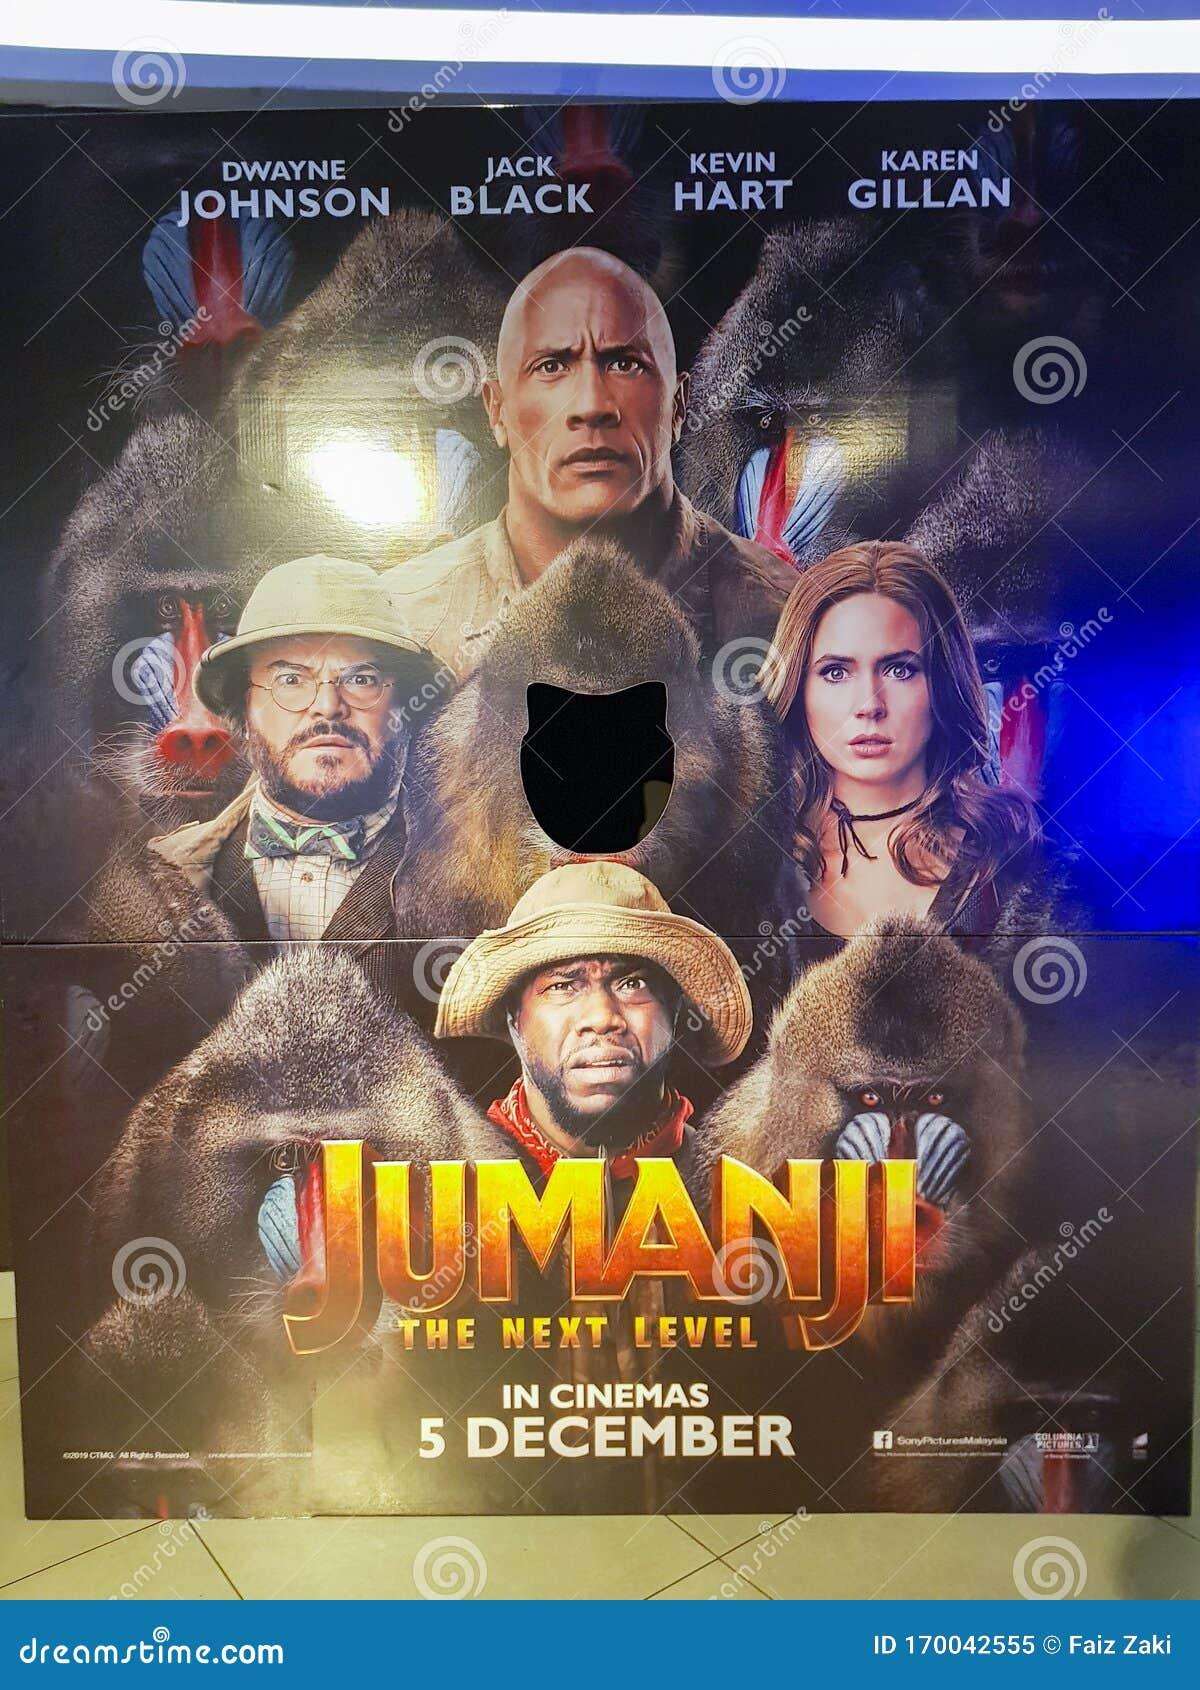 Jumanji The Next Level Movie Poster Is A 2019 American Fantasy Adventure Comedy Film Starring Dwayne Johnson Jack Black Kevin Editorial Image Image Of Fantasy Reason 170042555